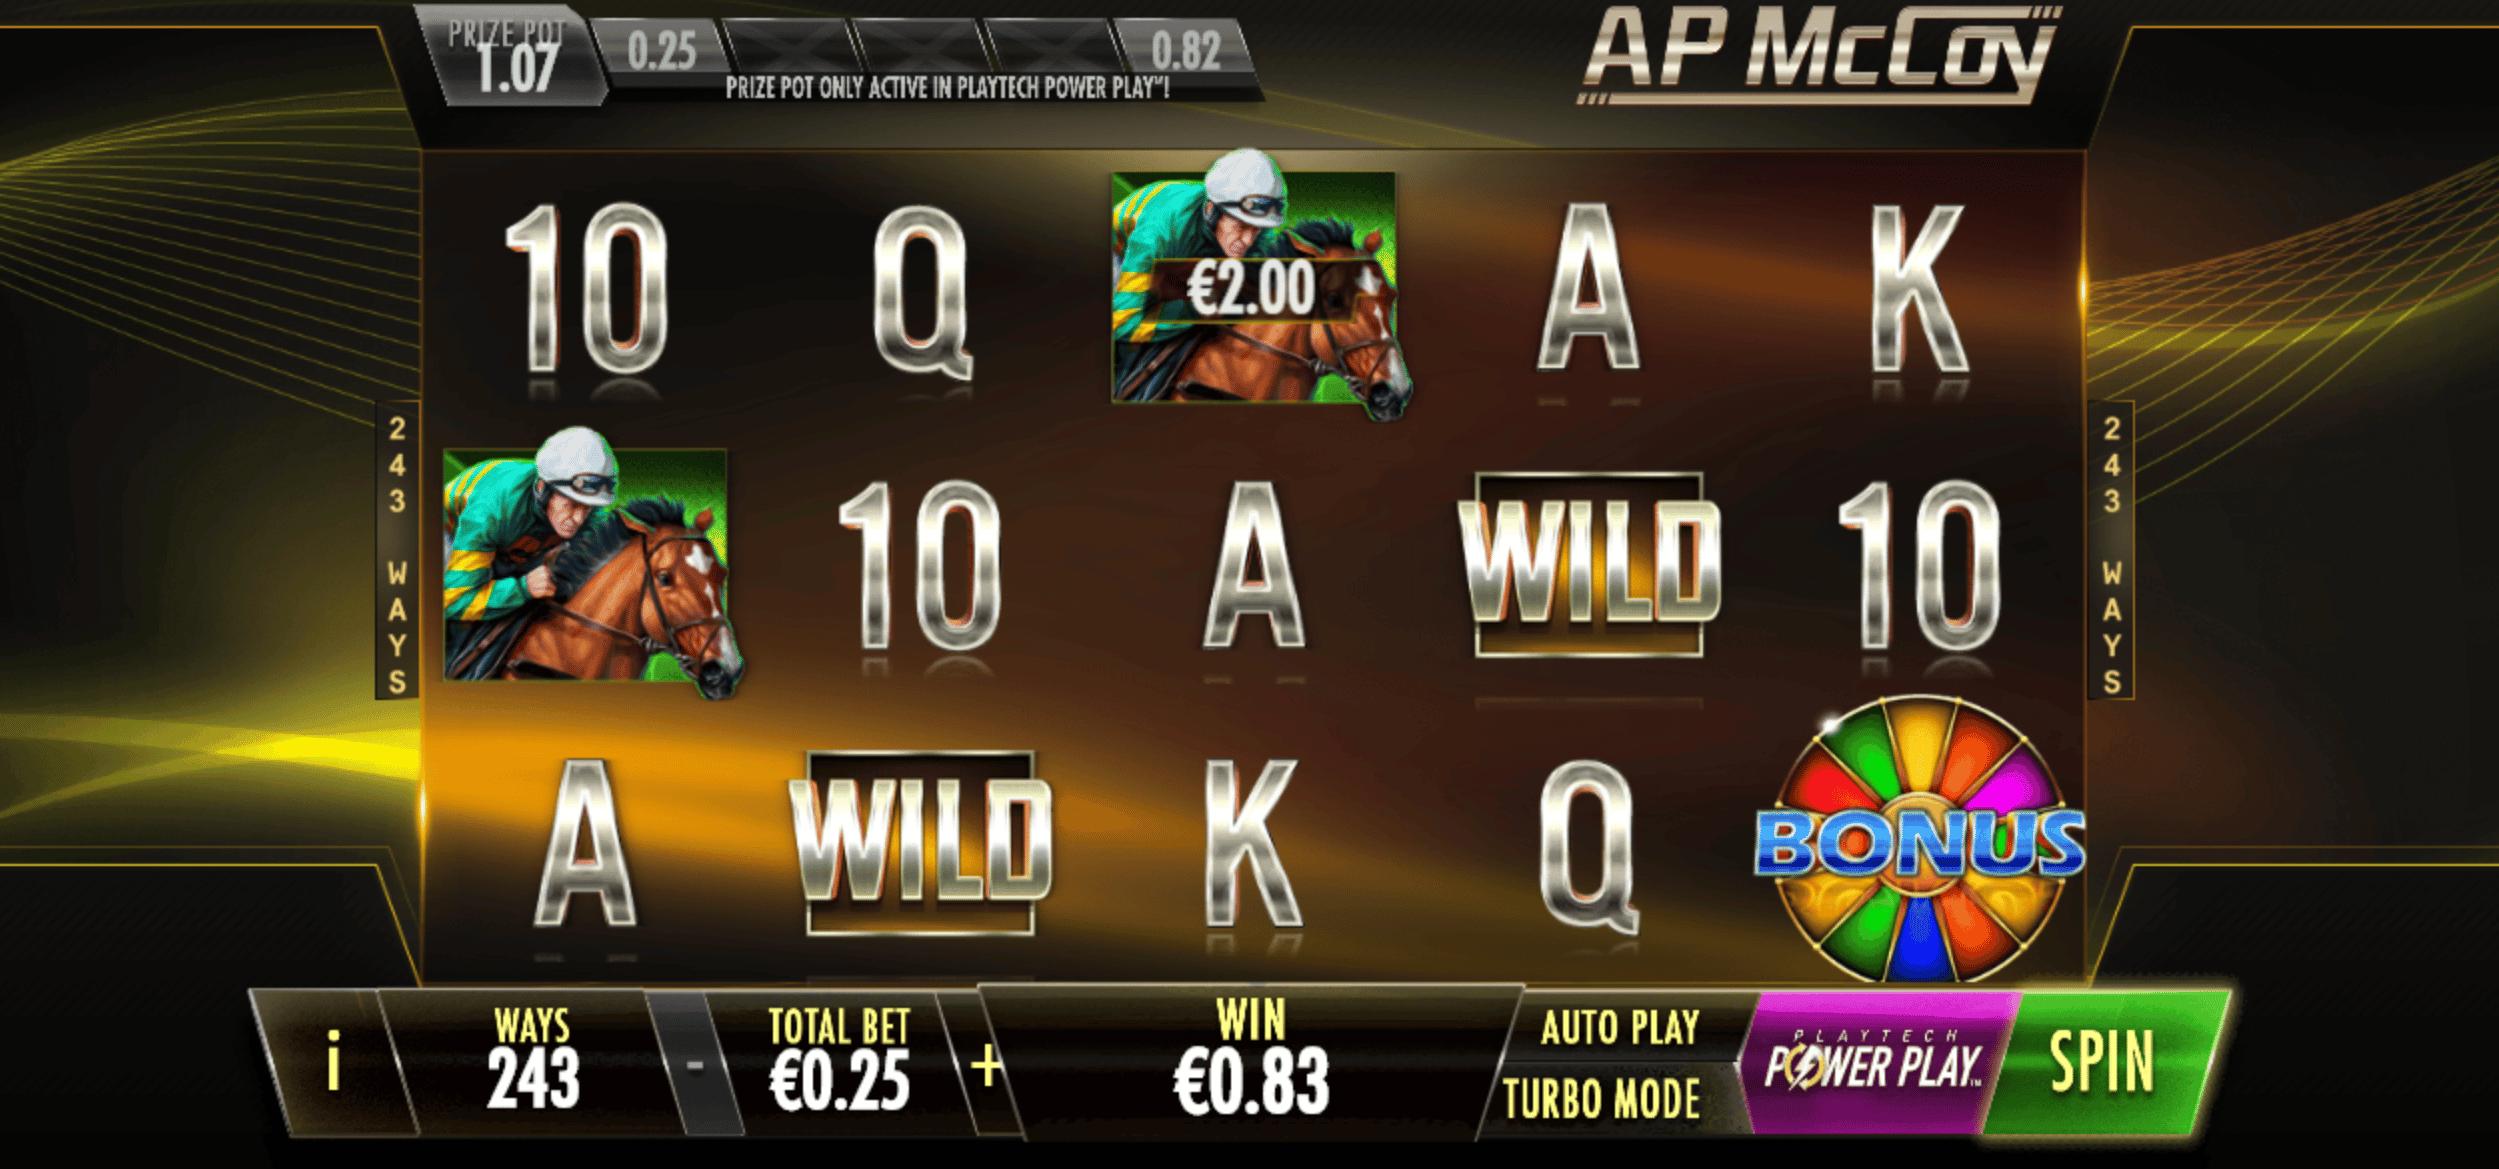 New Ap Mccoy Sporting Legends Slot Goes Live Casino Chronicle